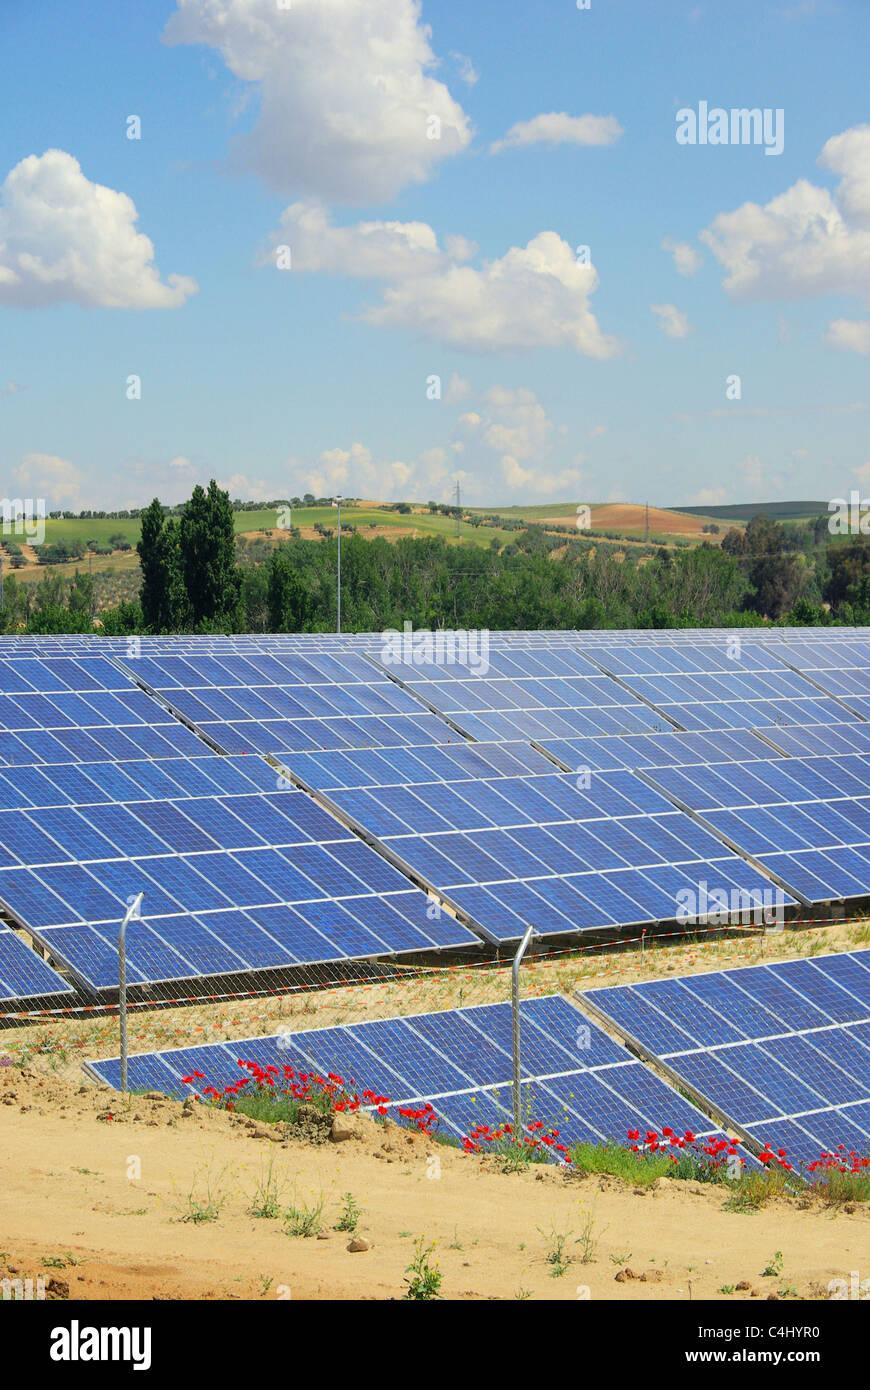 Solaranlage auf Feld - solar plant on field 02 - Stock Image